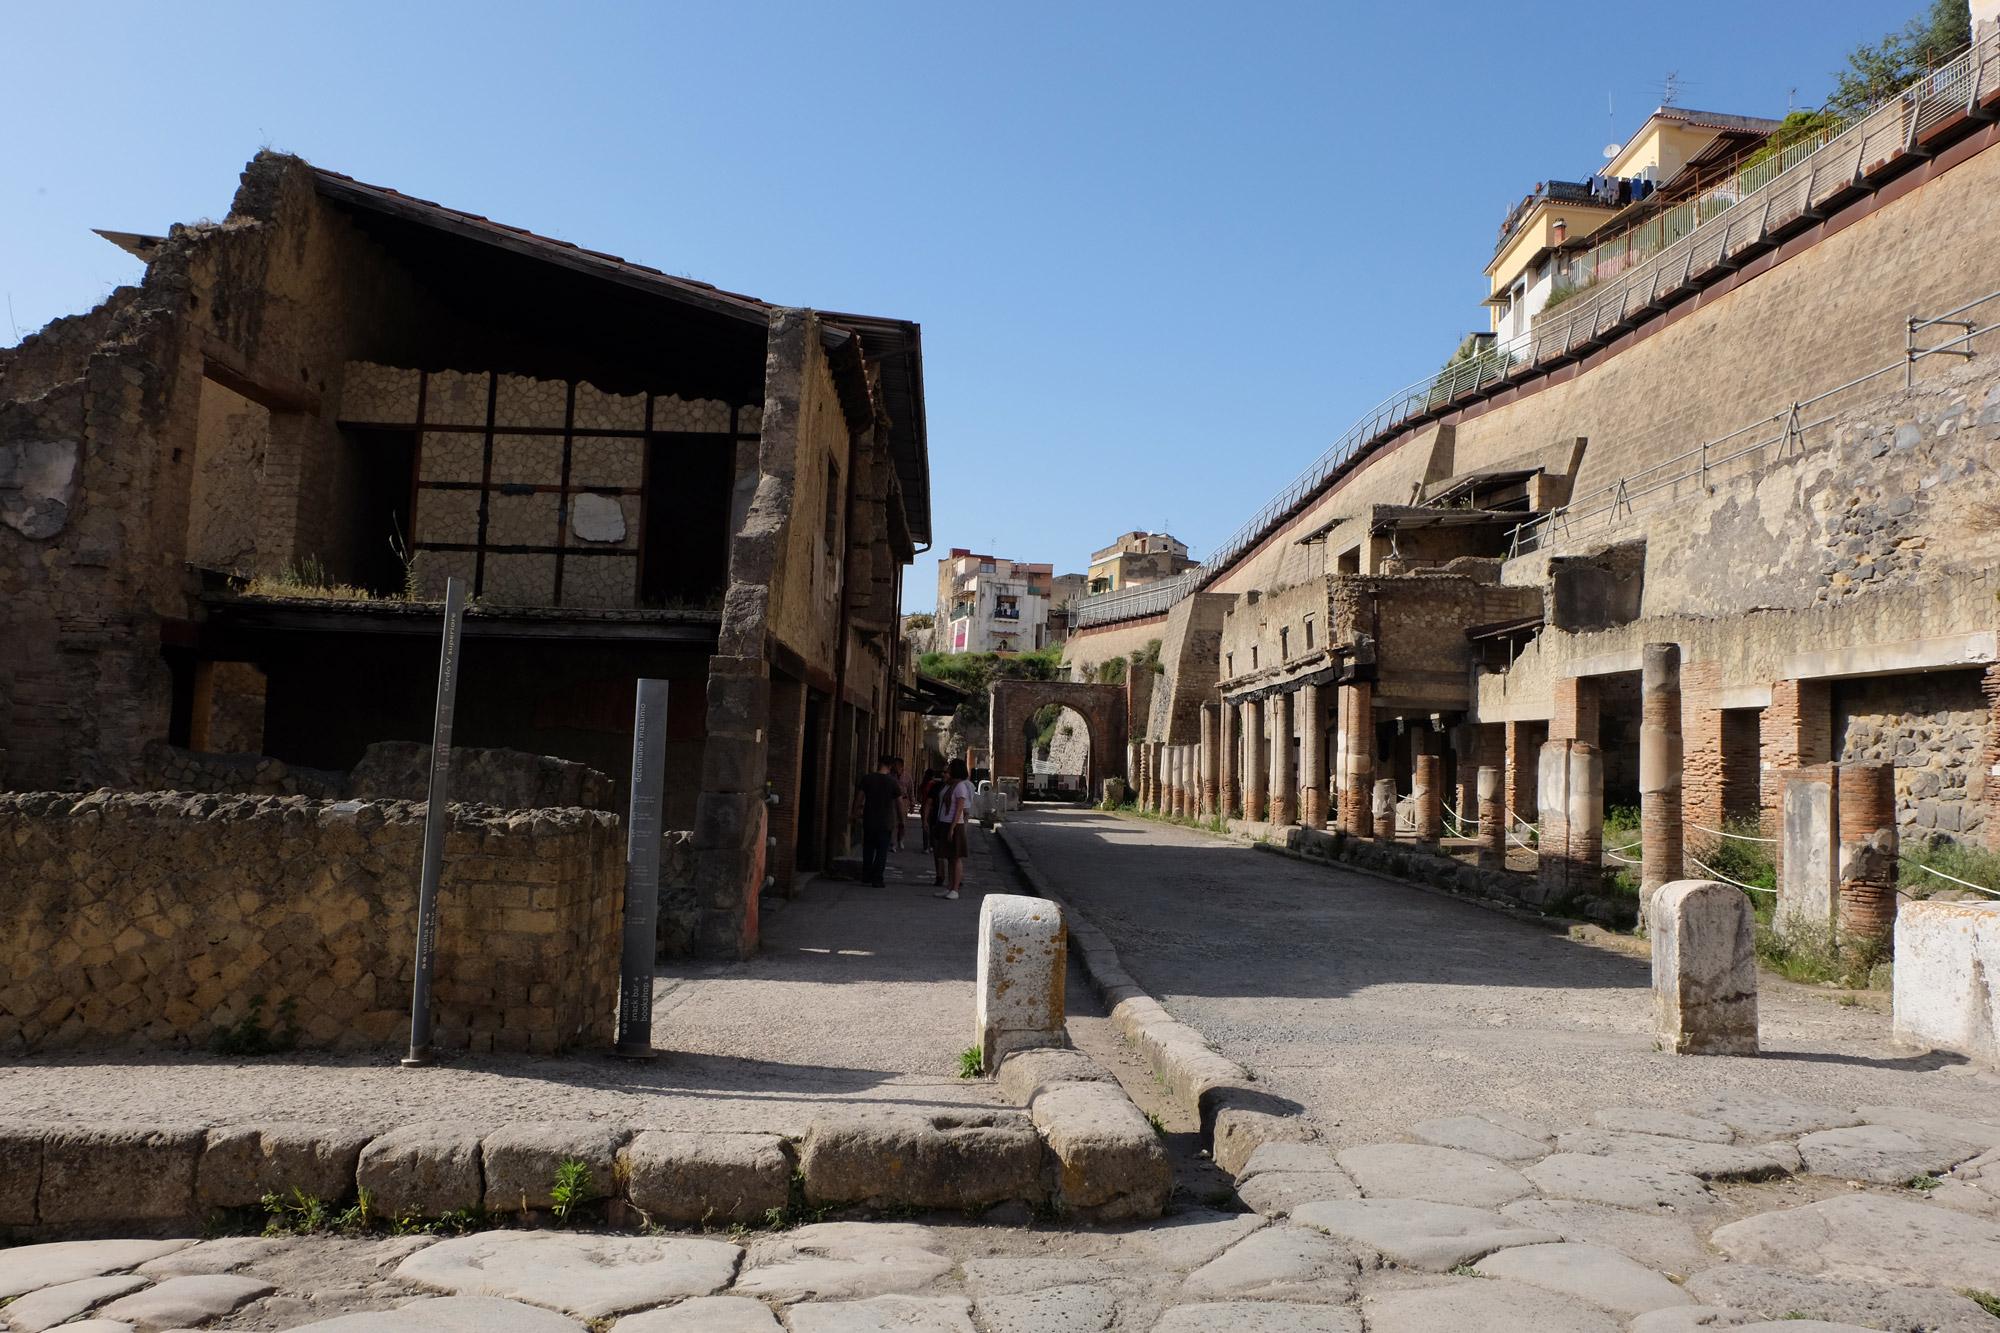 A street in Herculaneum